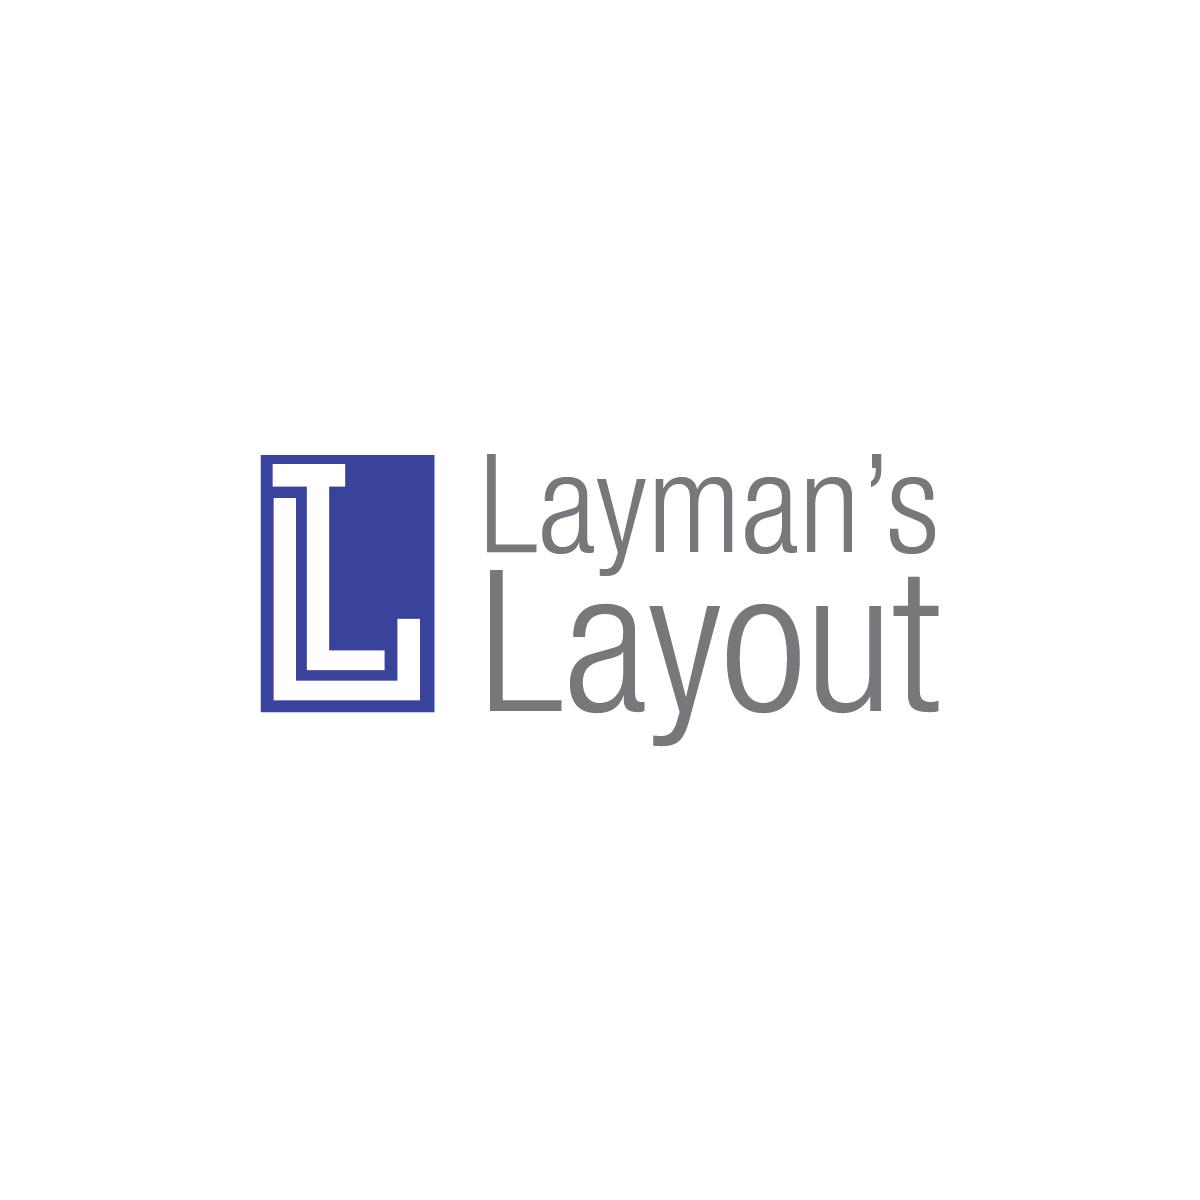 Layman's Layout